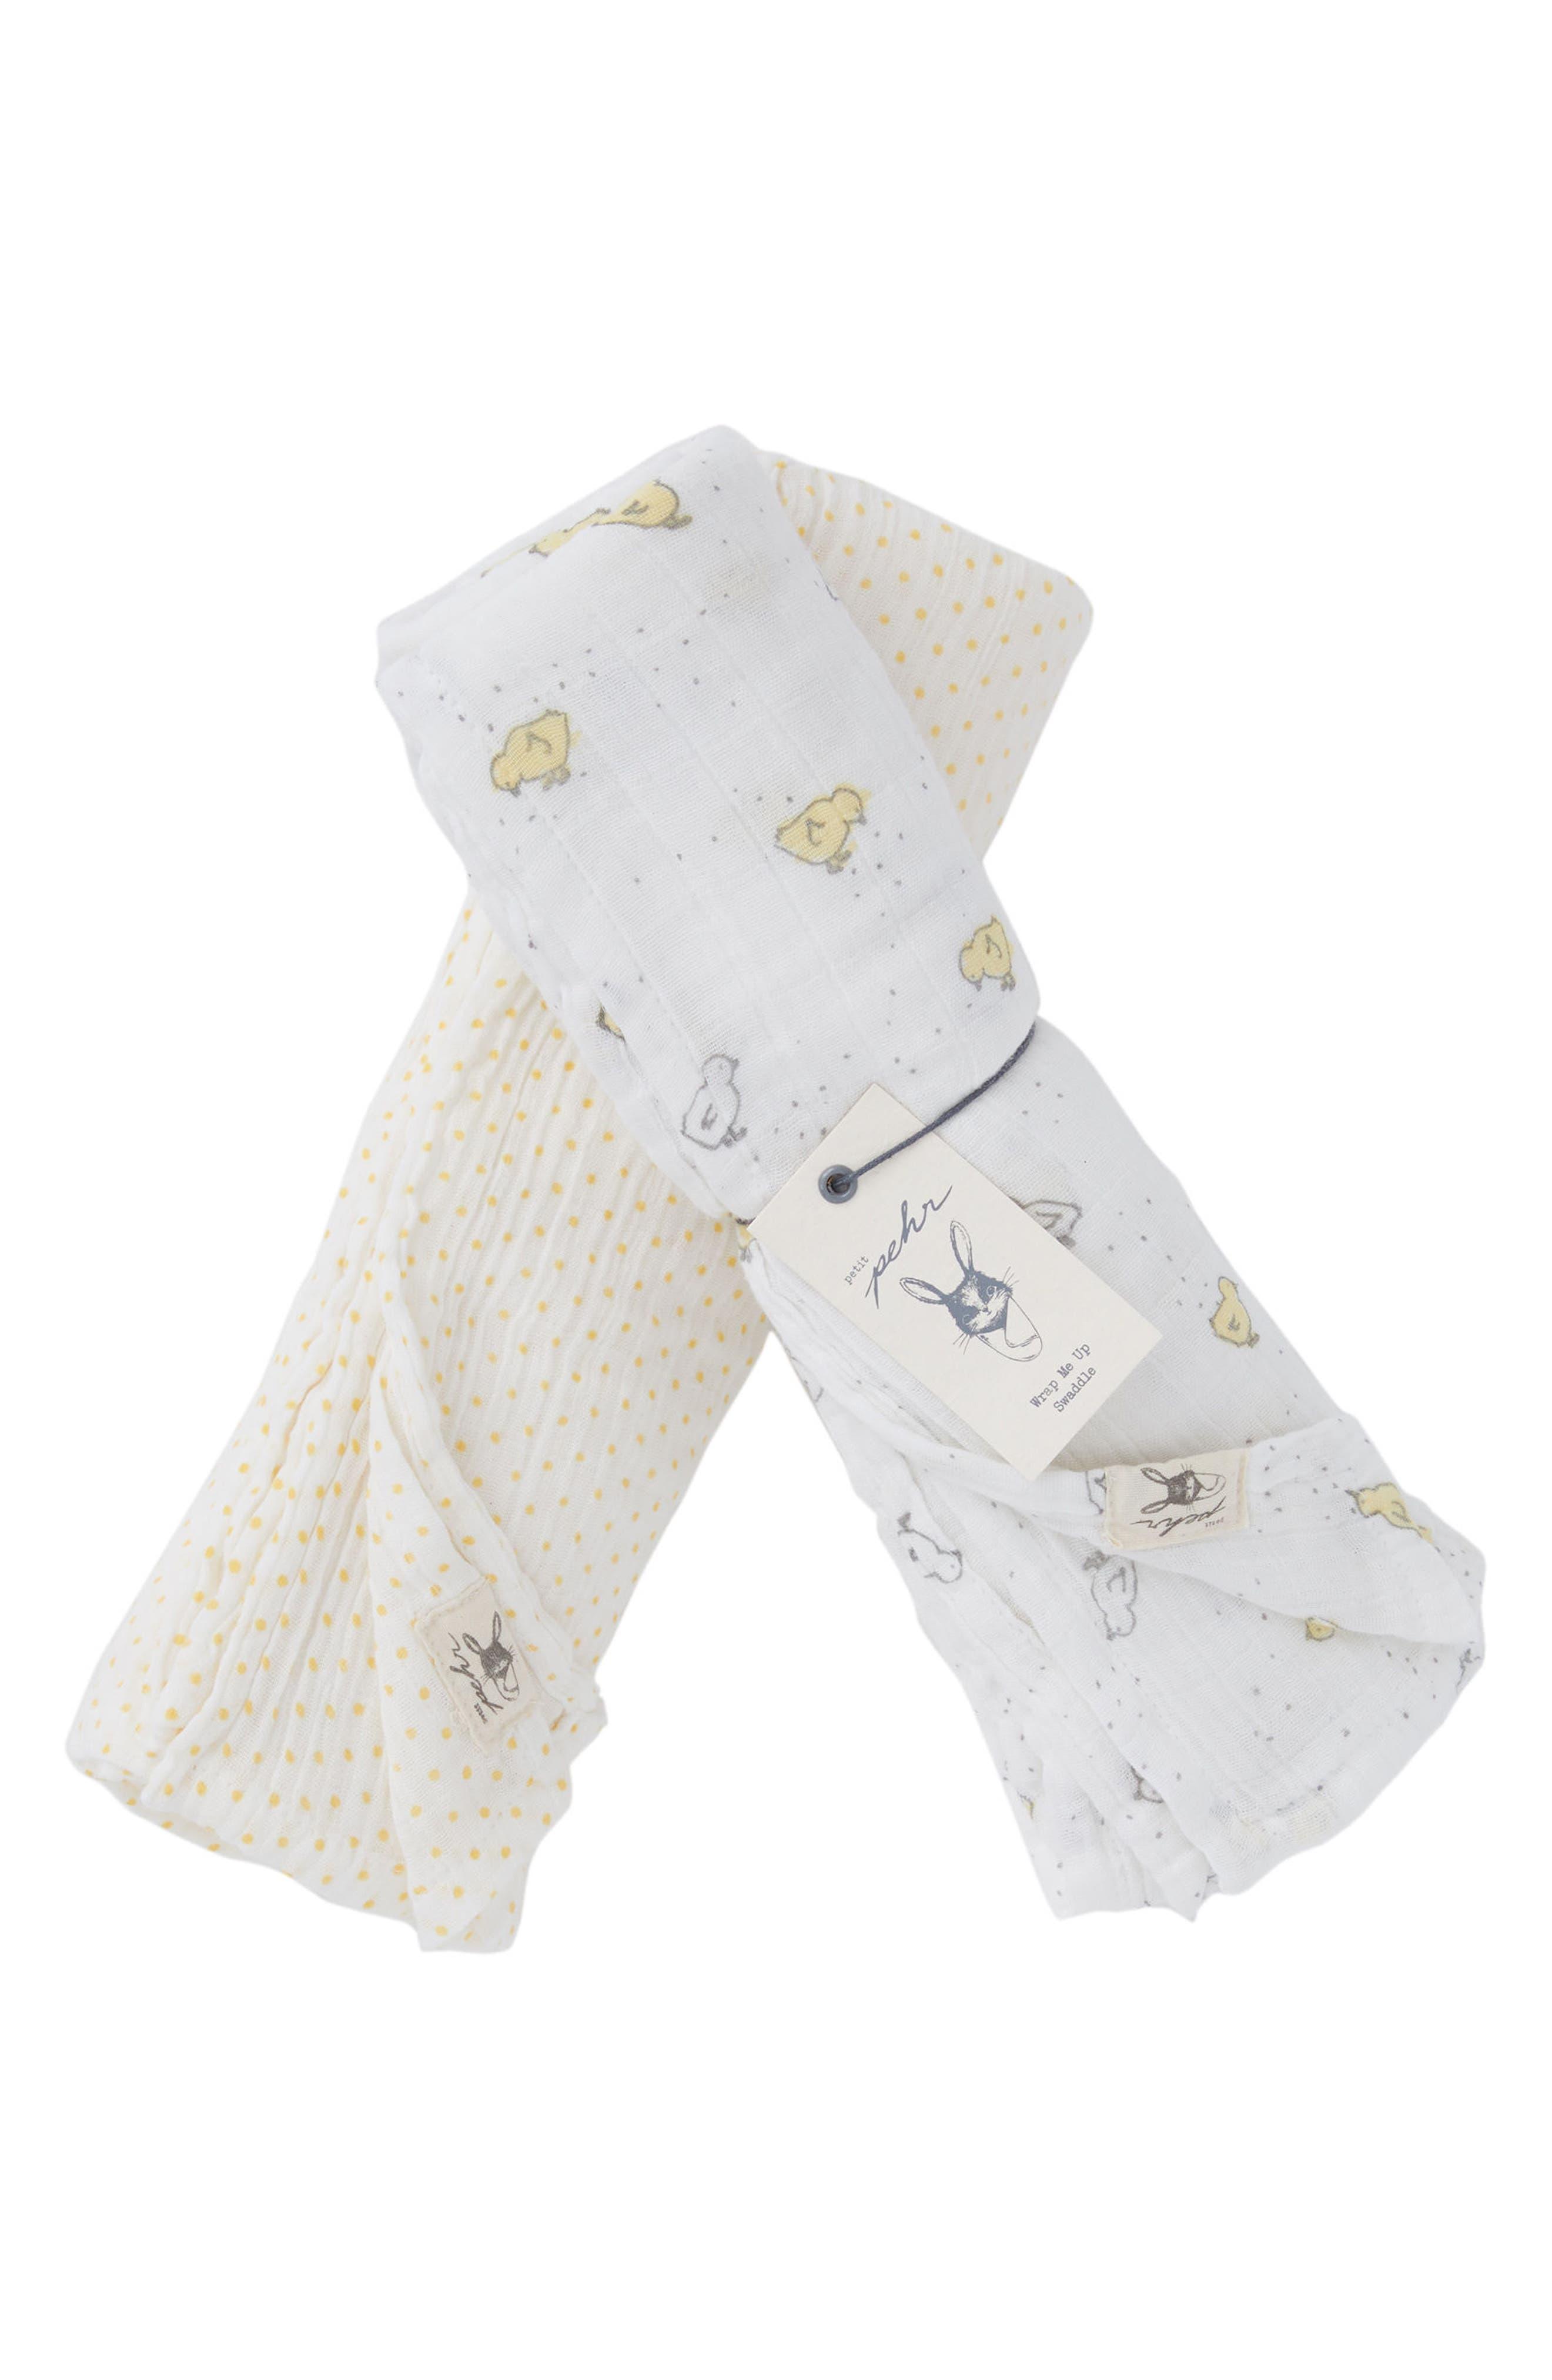 Chick Swaddle Blanket Set,                         Main,                         color, Cream